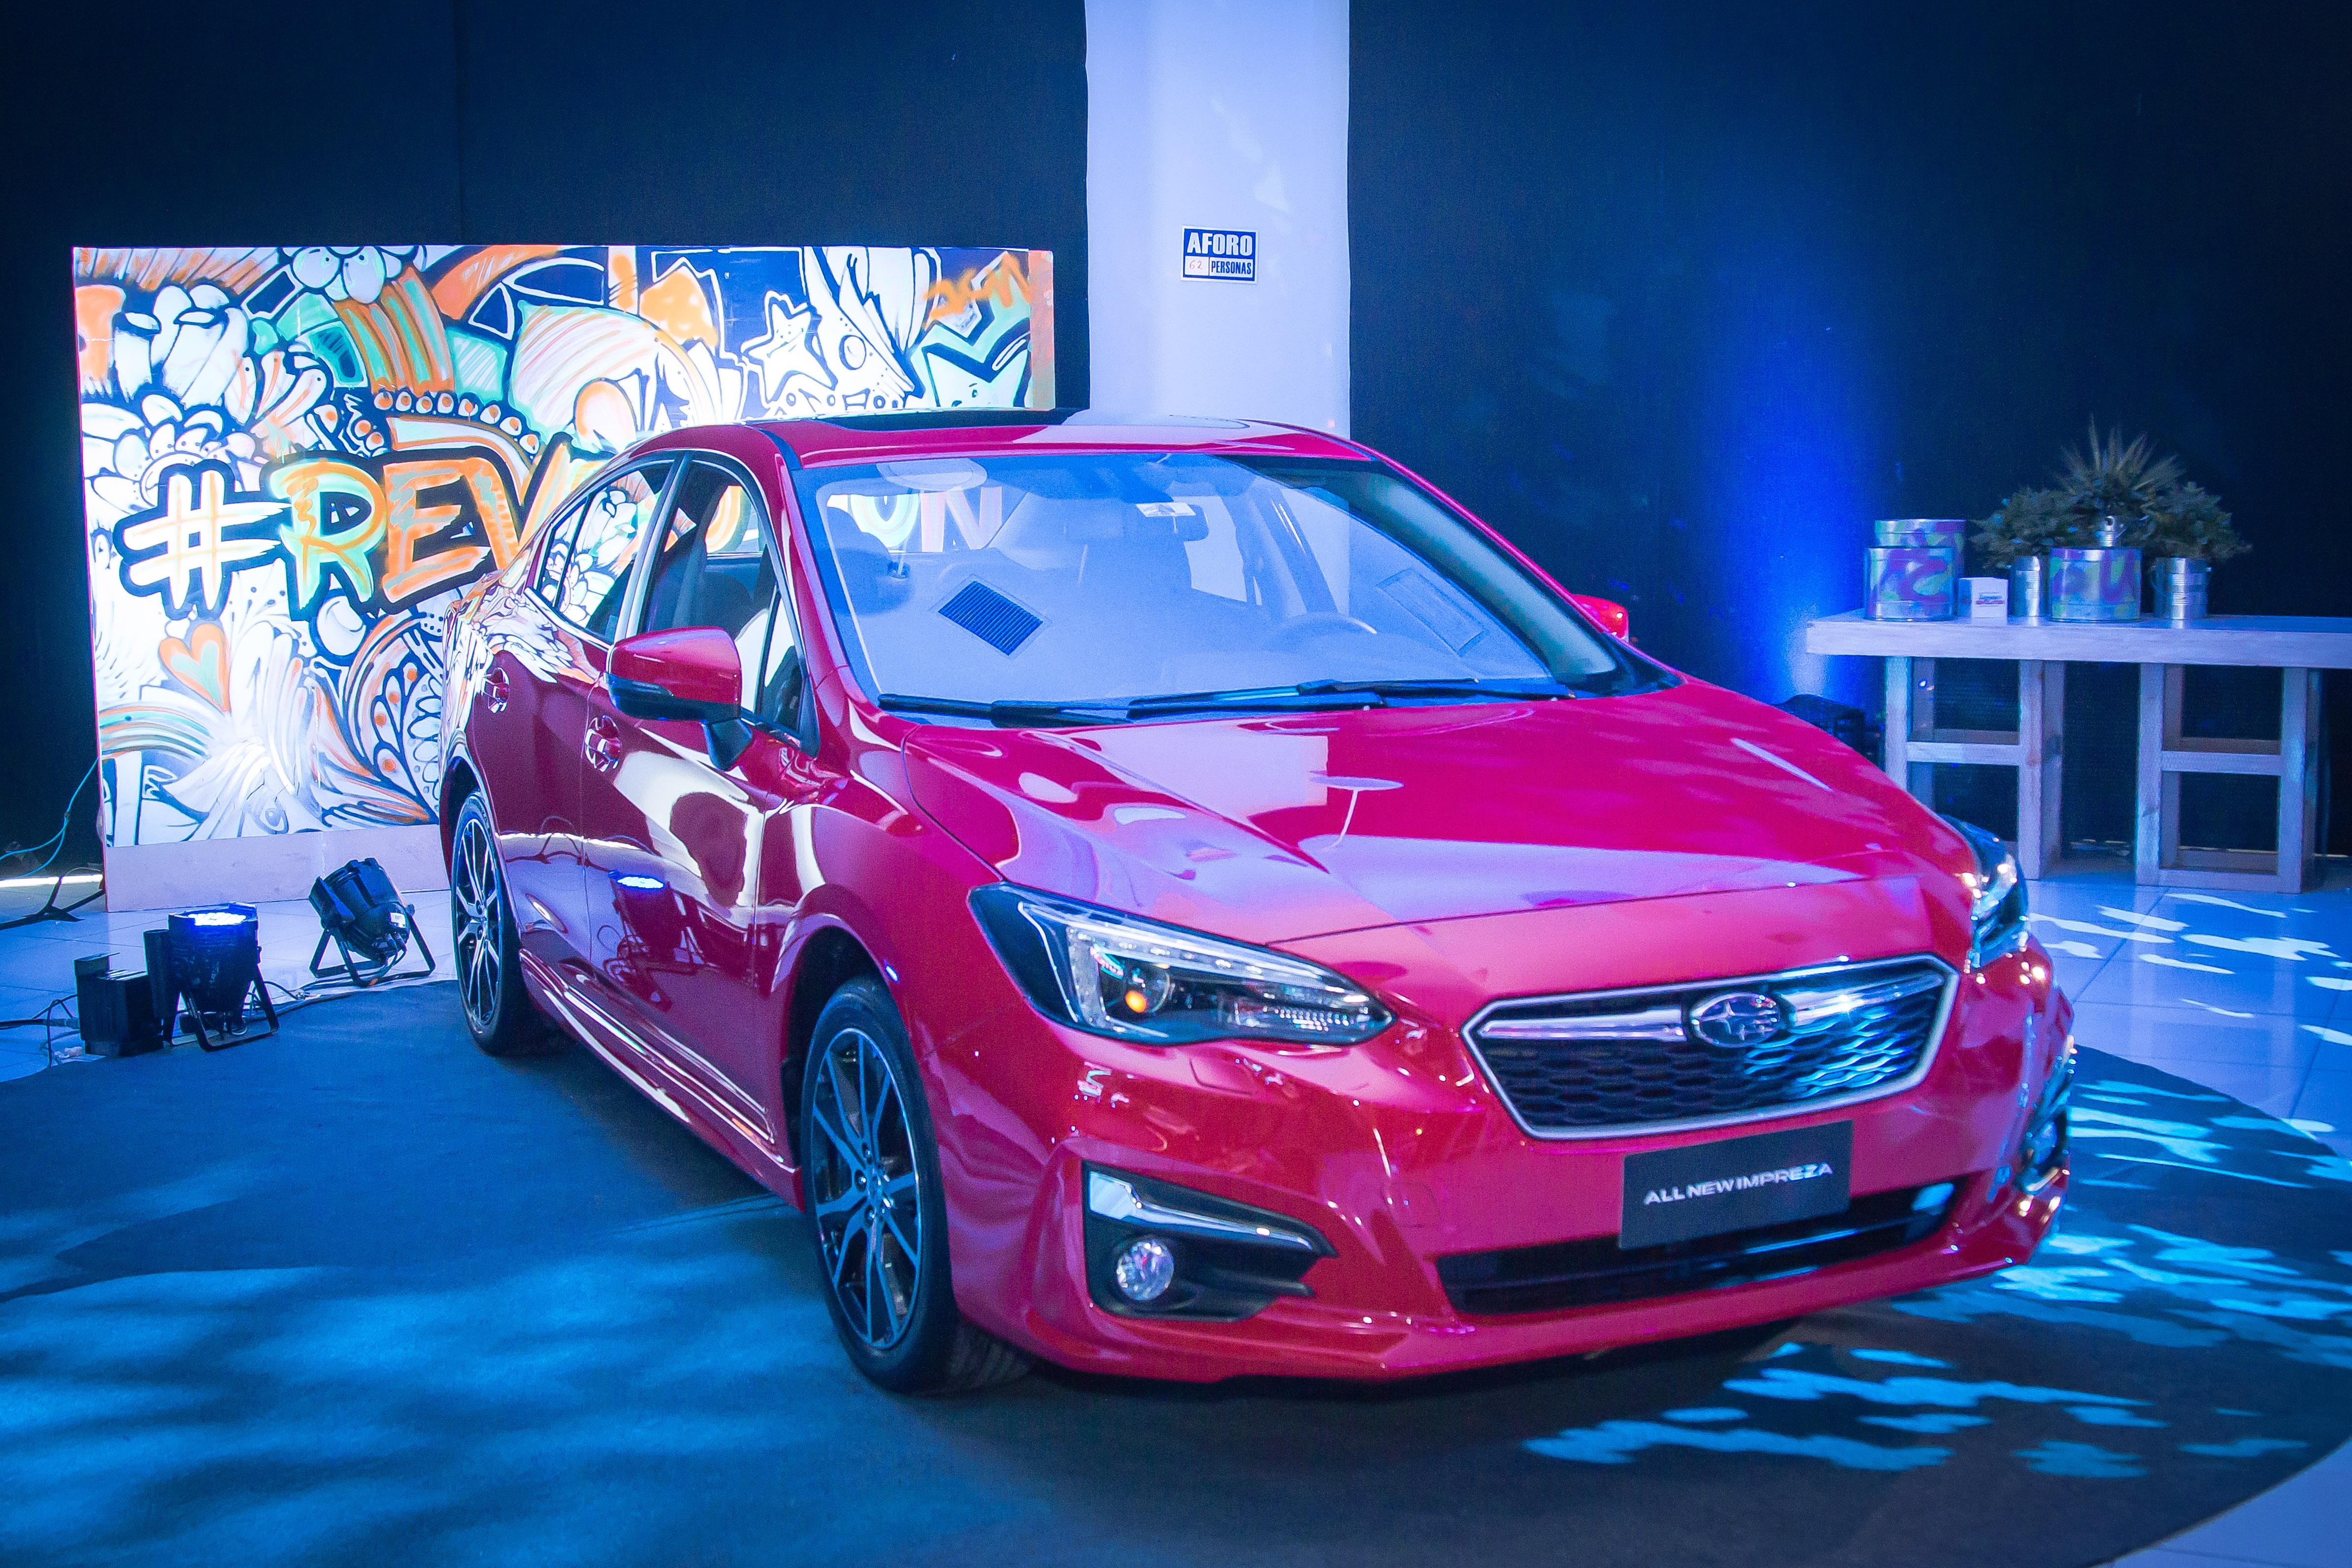 All New Subaru Impreza 2017 llegó al Peru